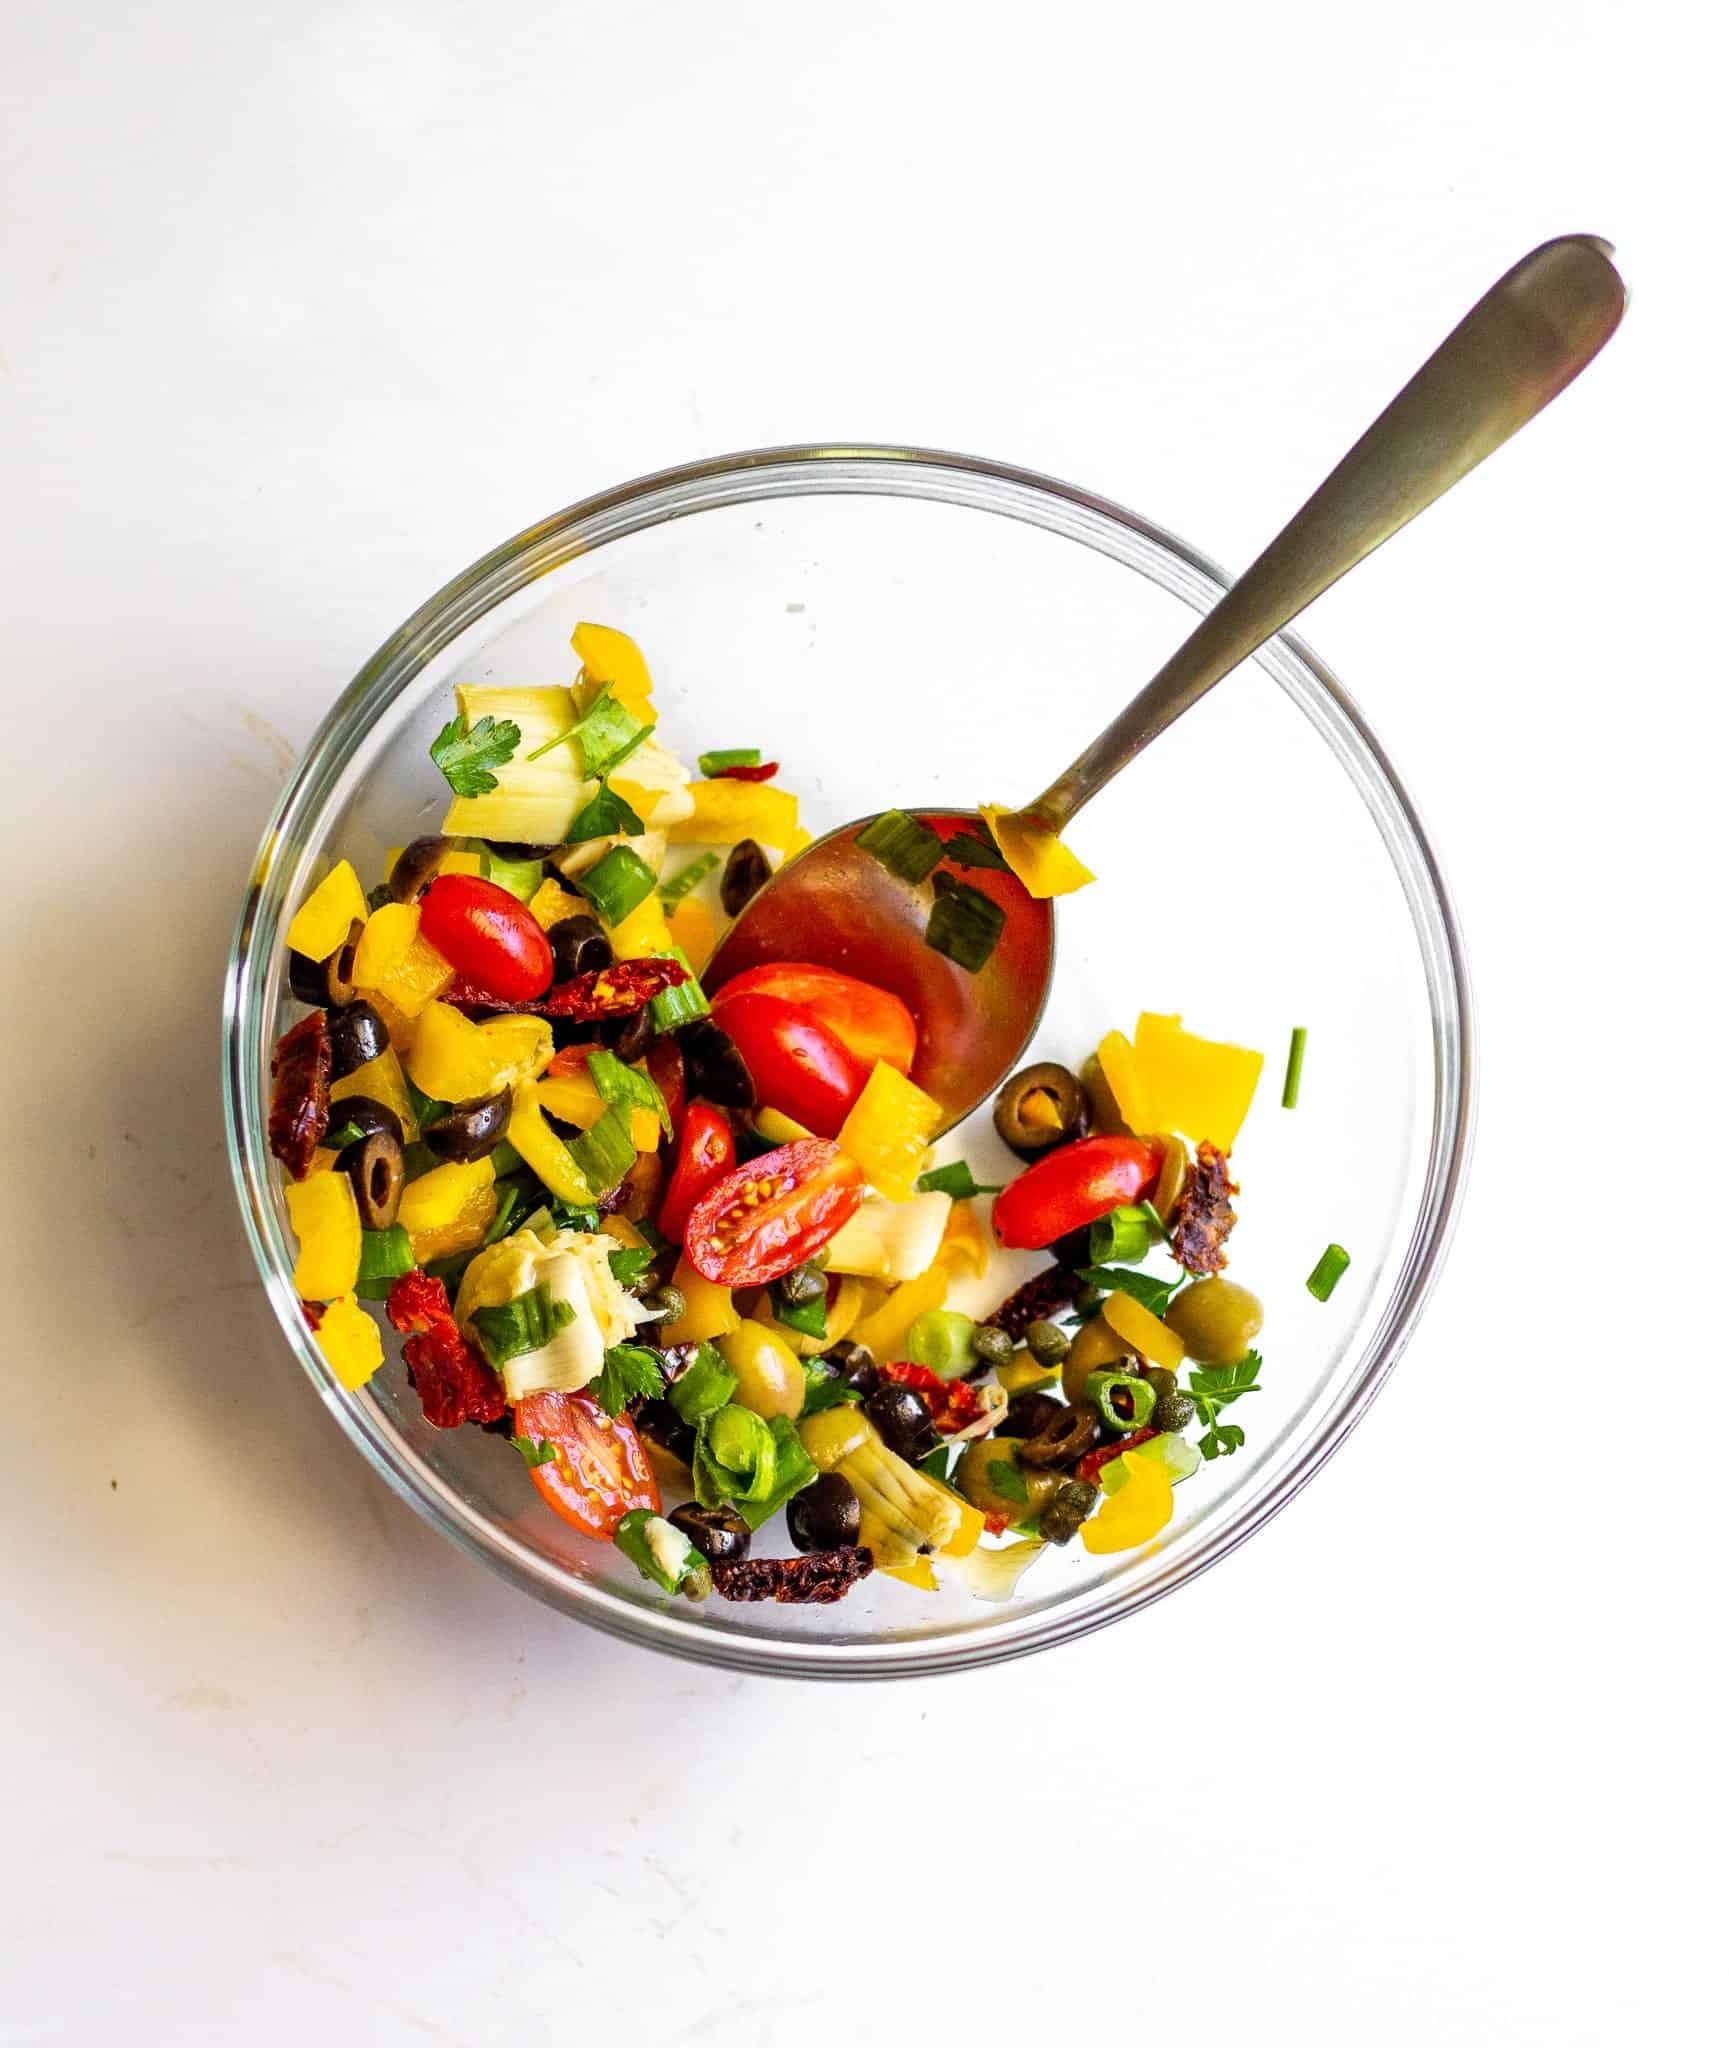 Low FODMAP Vegetarian Antipasto Salad #lowfodmap #vegan #glutenfree #dairyfree